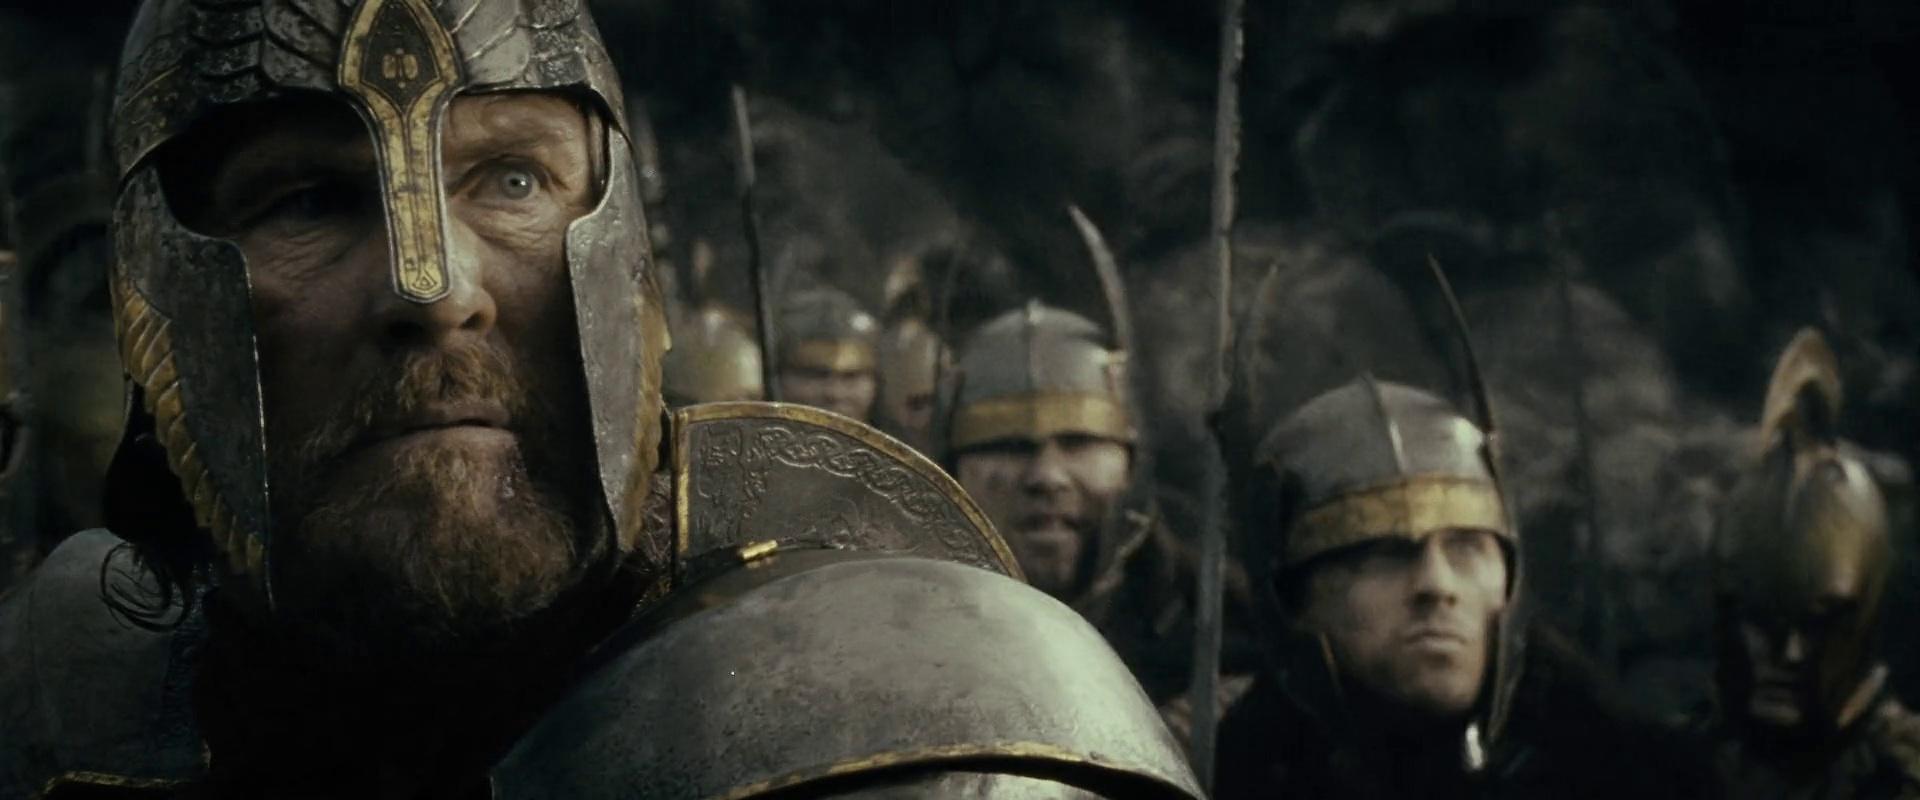 Elendil Armor Request - Skyrim Mod Requests - The Nexus Forums